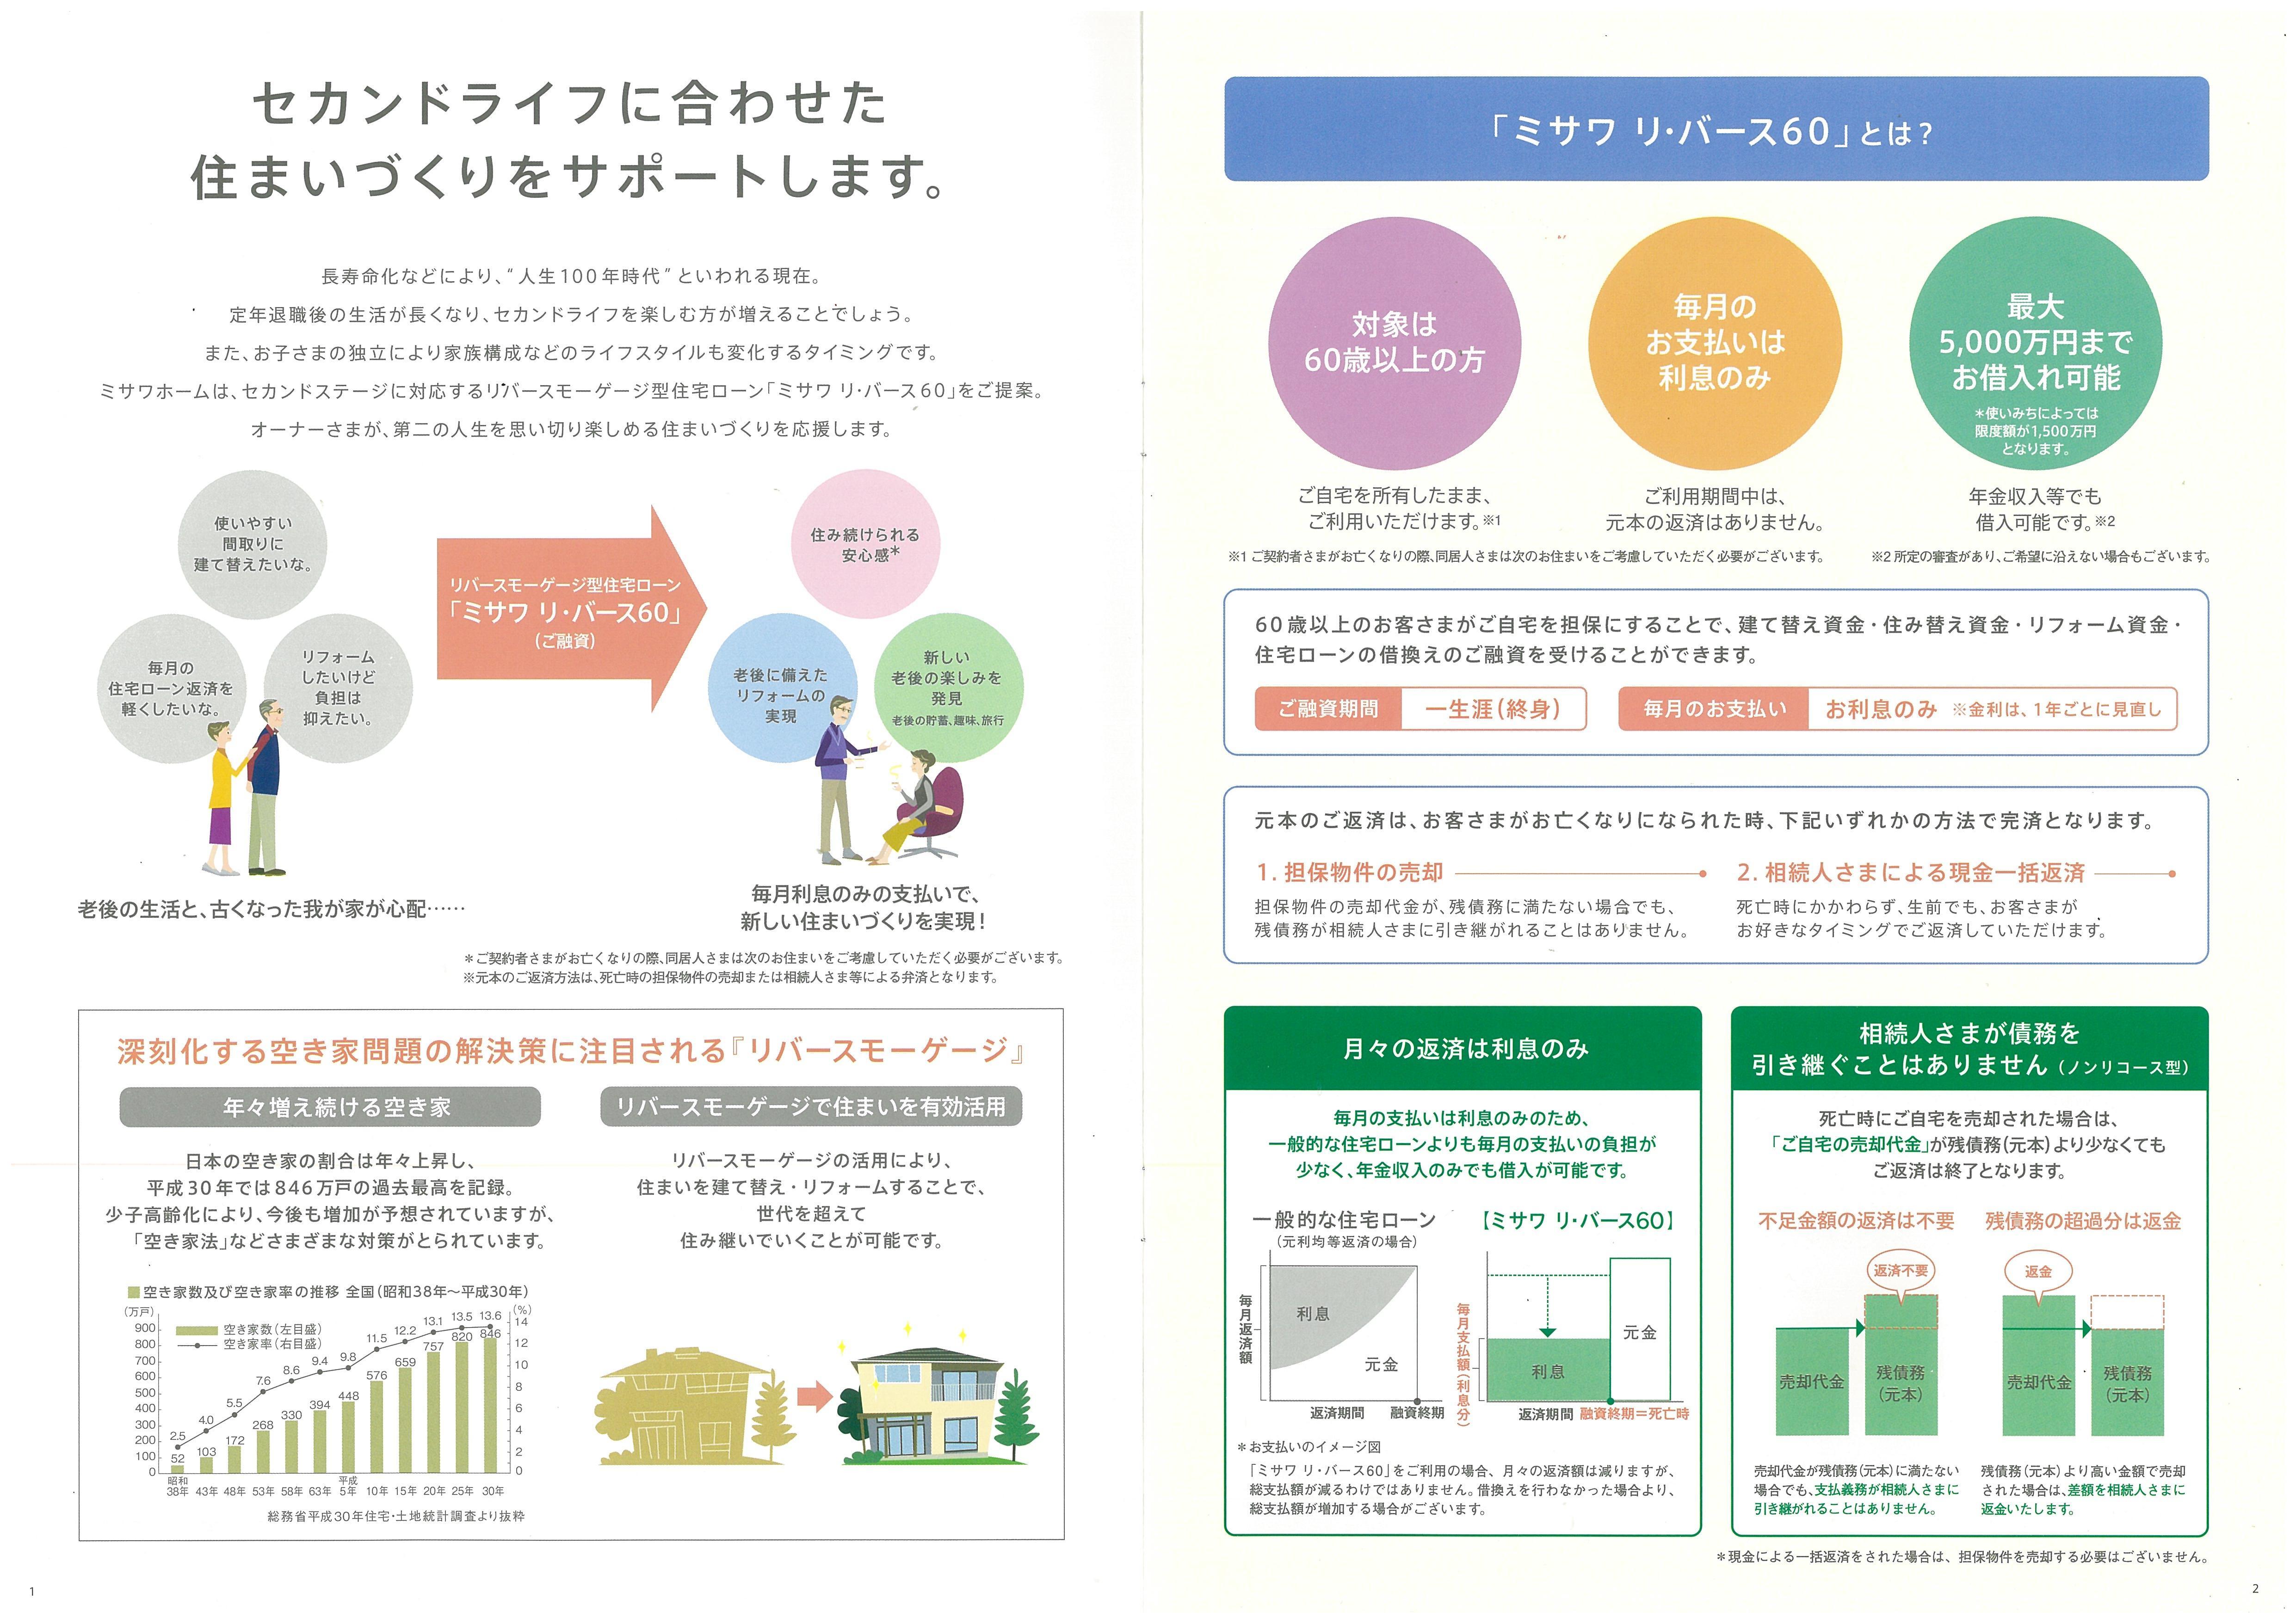 http://shikoku.misawa.co.jp/area_kouchi/60cd0380efd25225e444079d20bdc9b01fd2b886.jpg